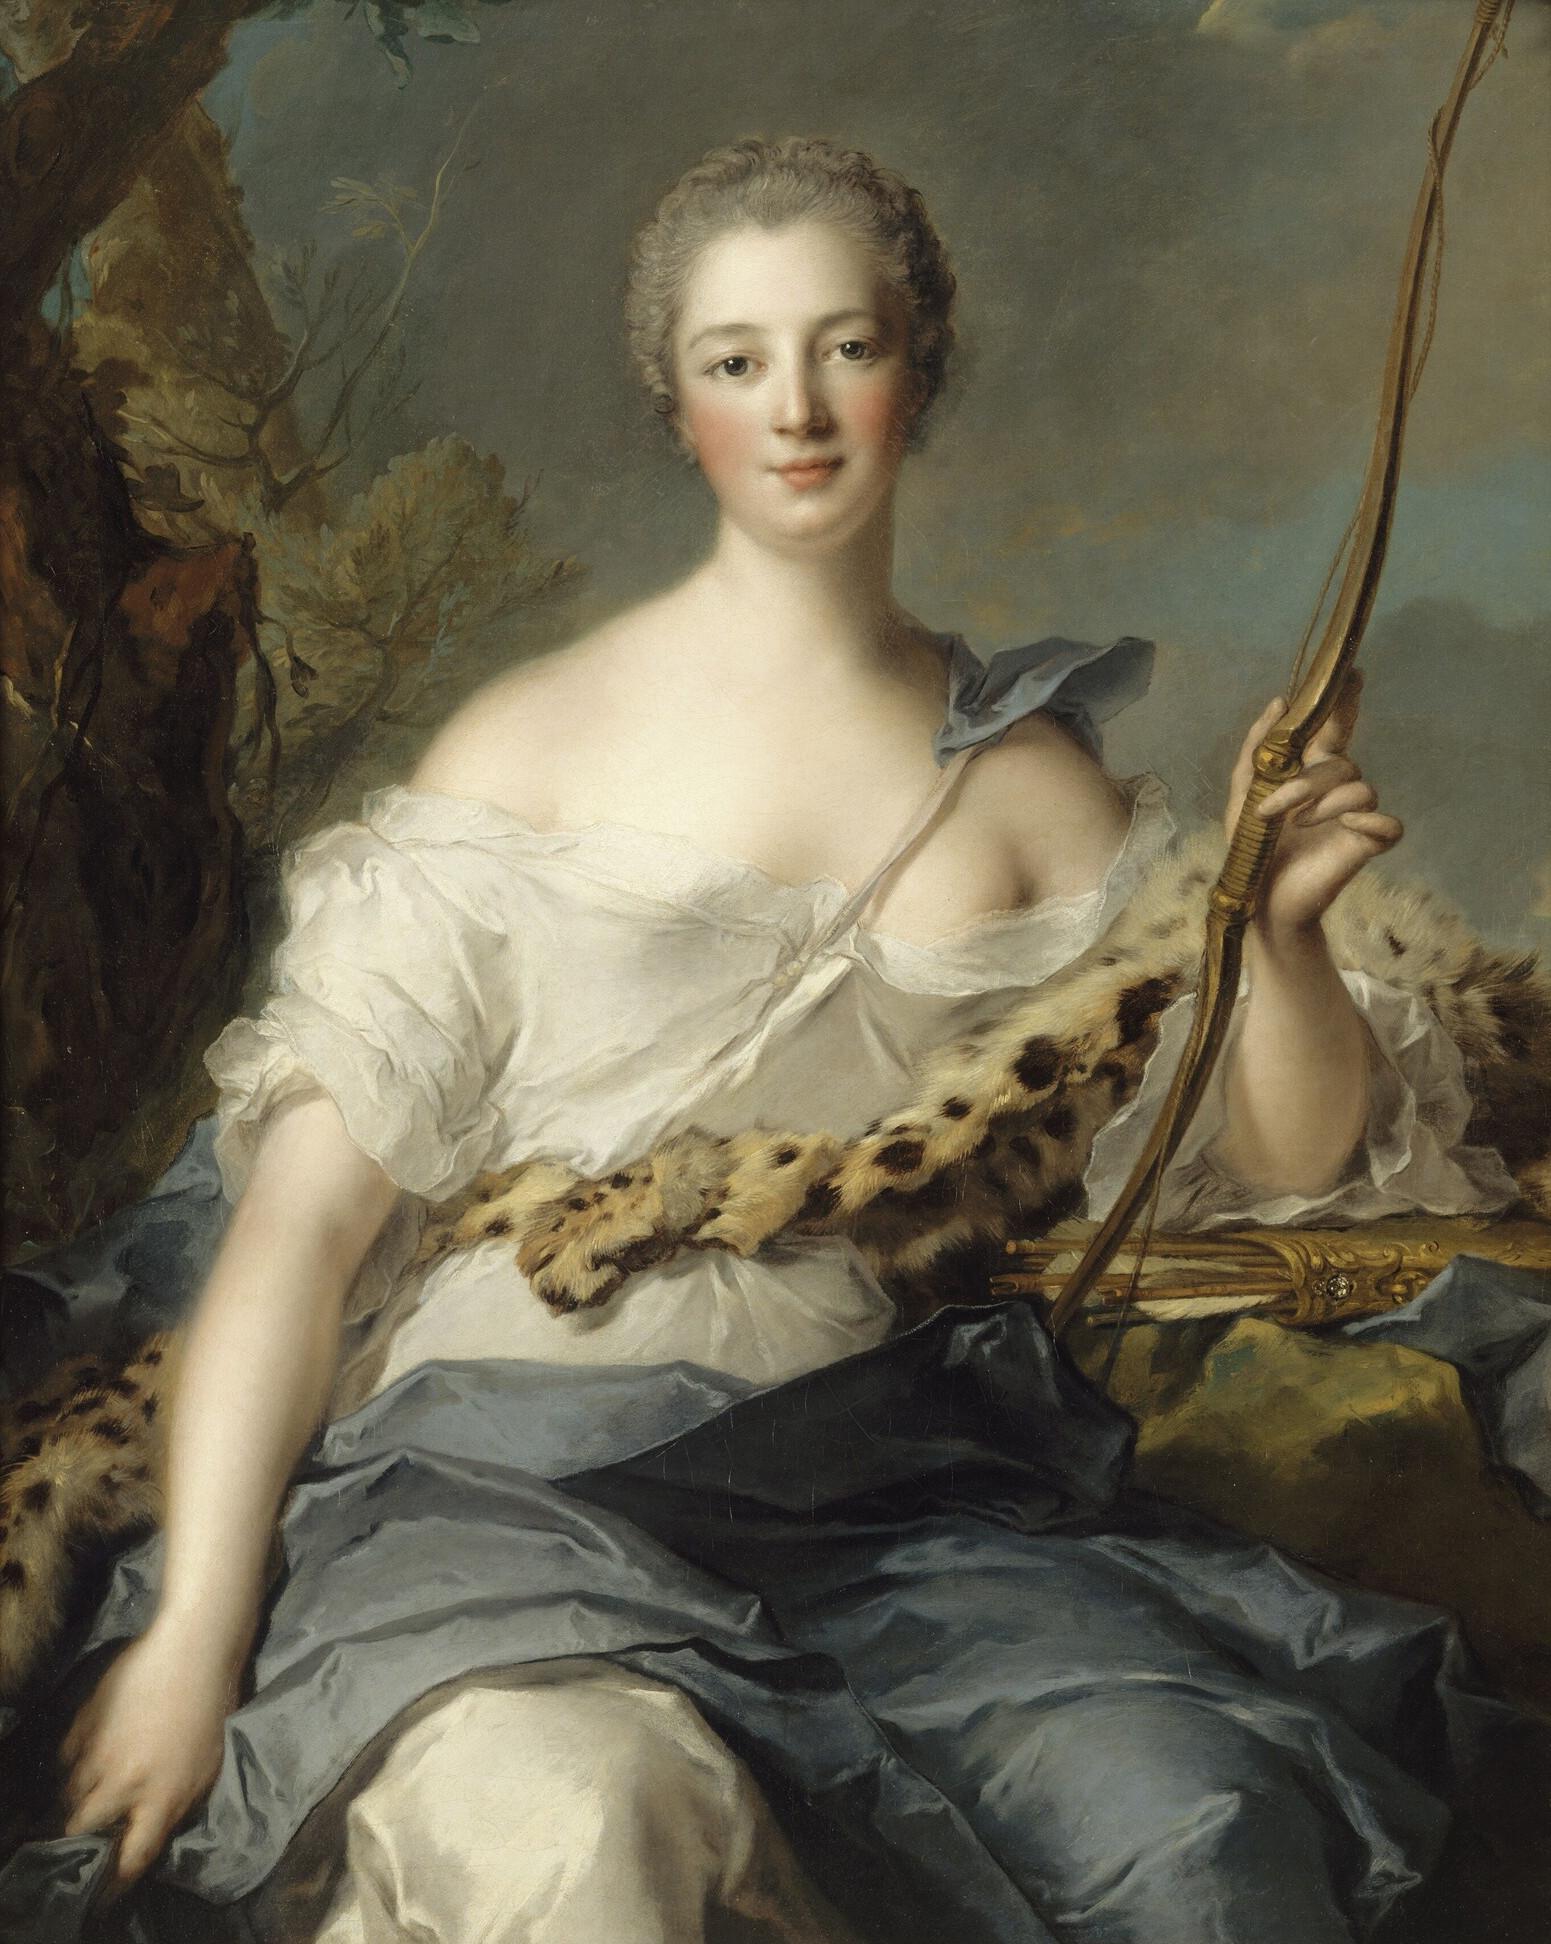 Jean-Marc_Nattier%2C_Madame_de_Pompadour_en_Diane_(1746).jpg